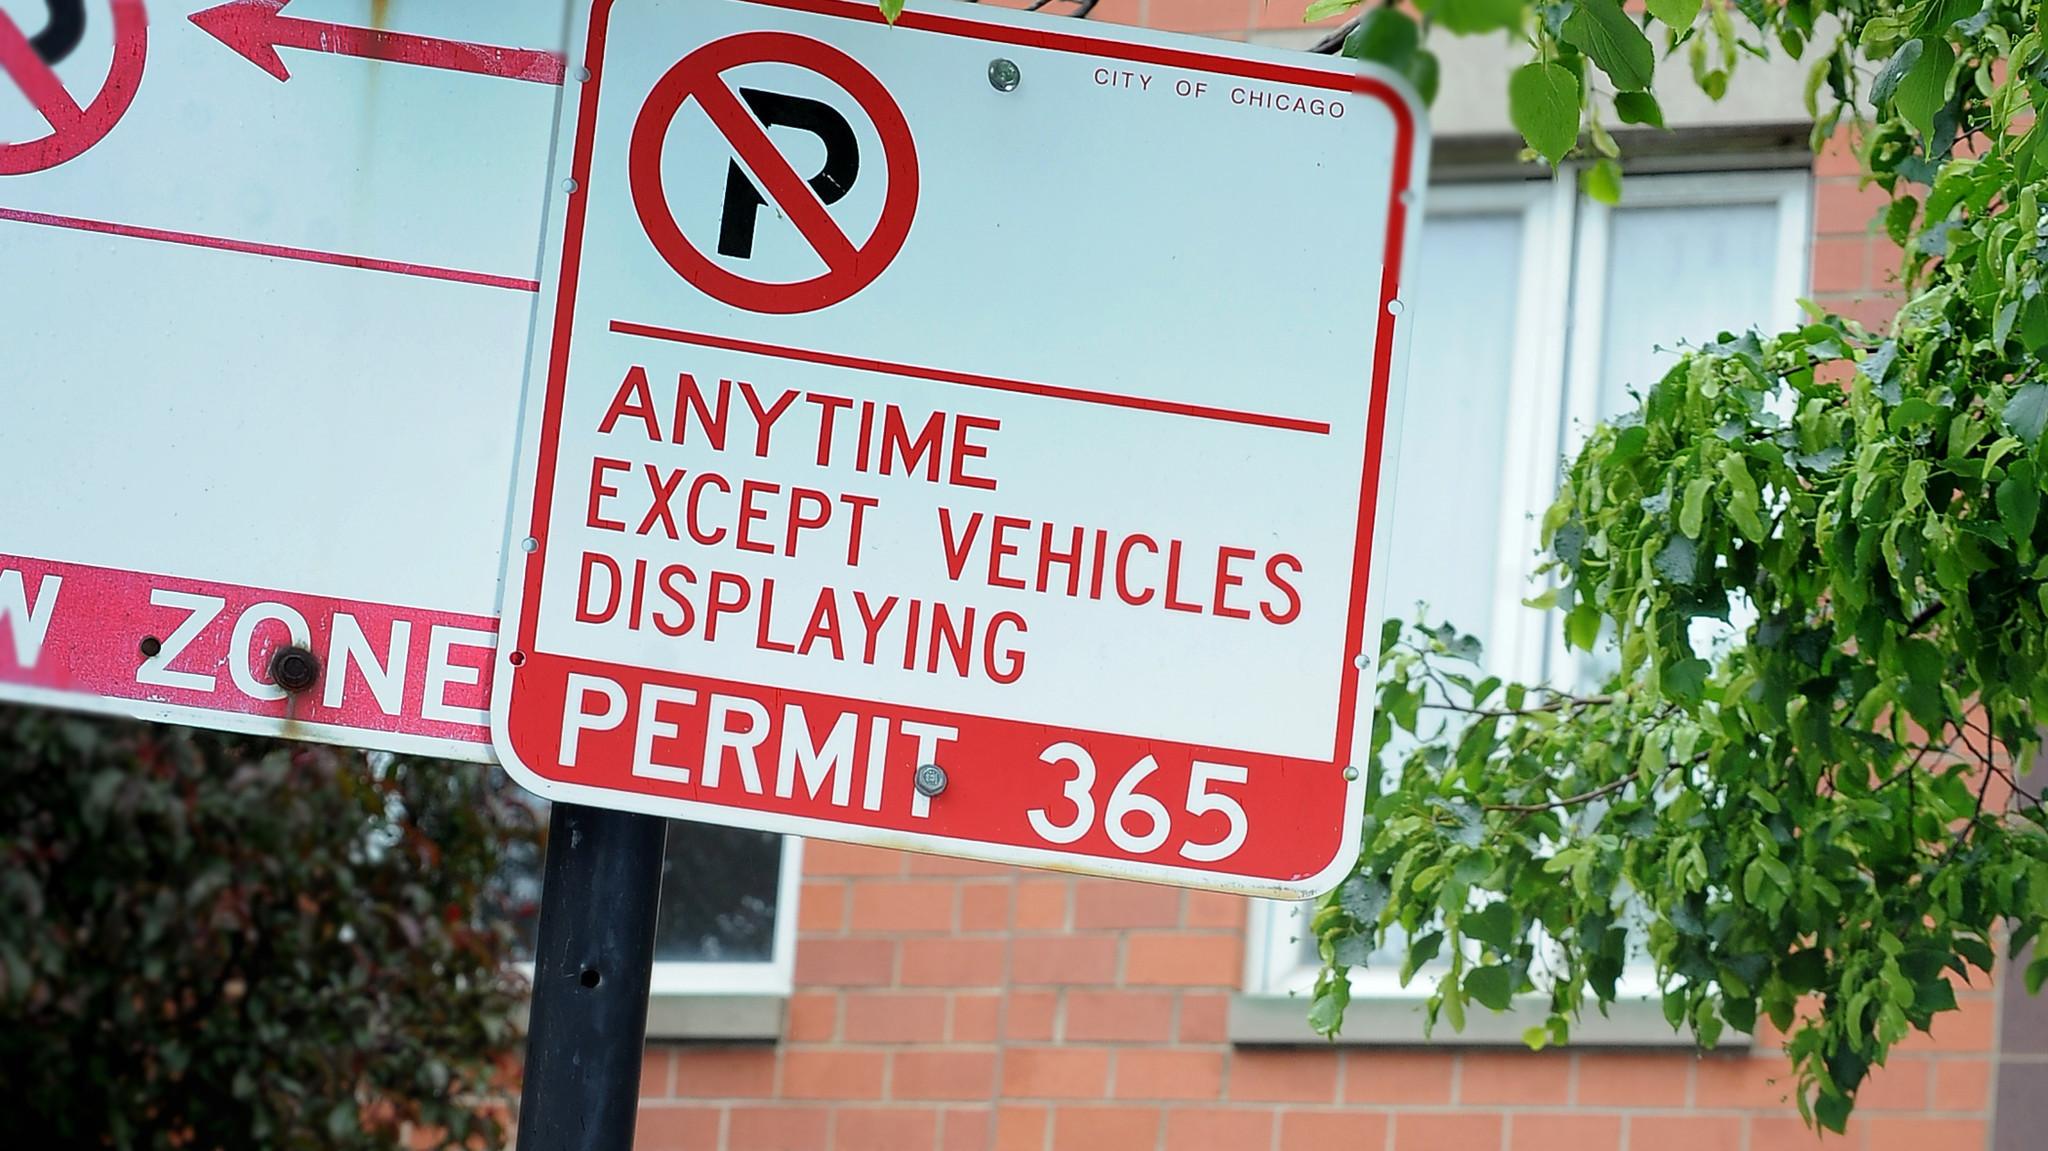 Permit Parking Chicago Map.Smartchicago City Produce Restricted Zones Map Chicago Tribune